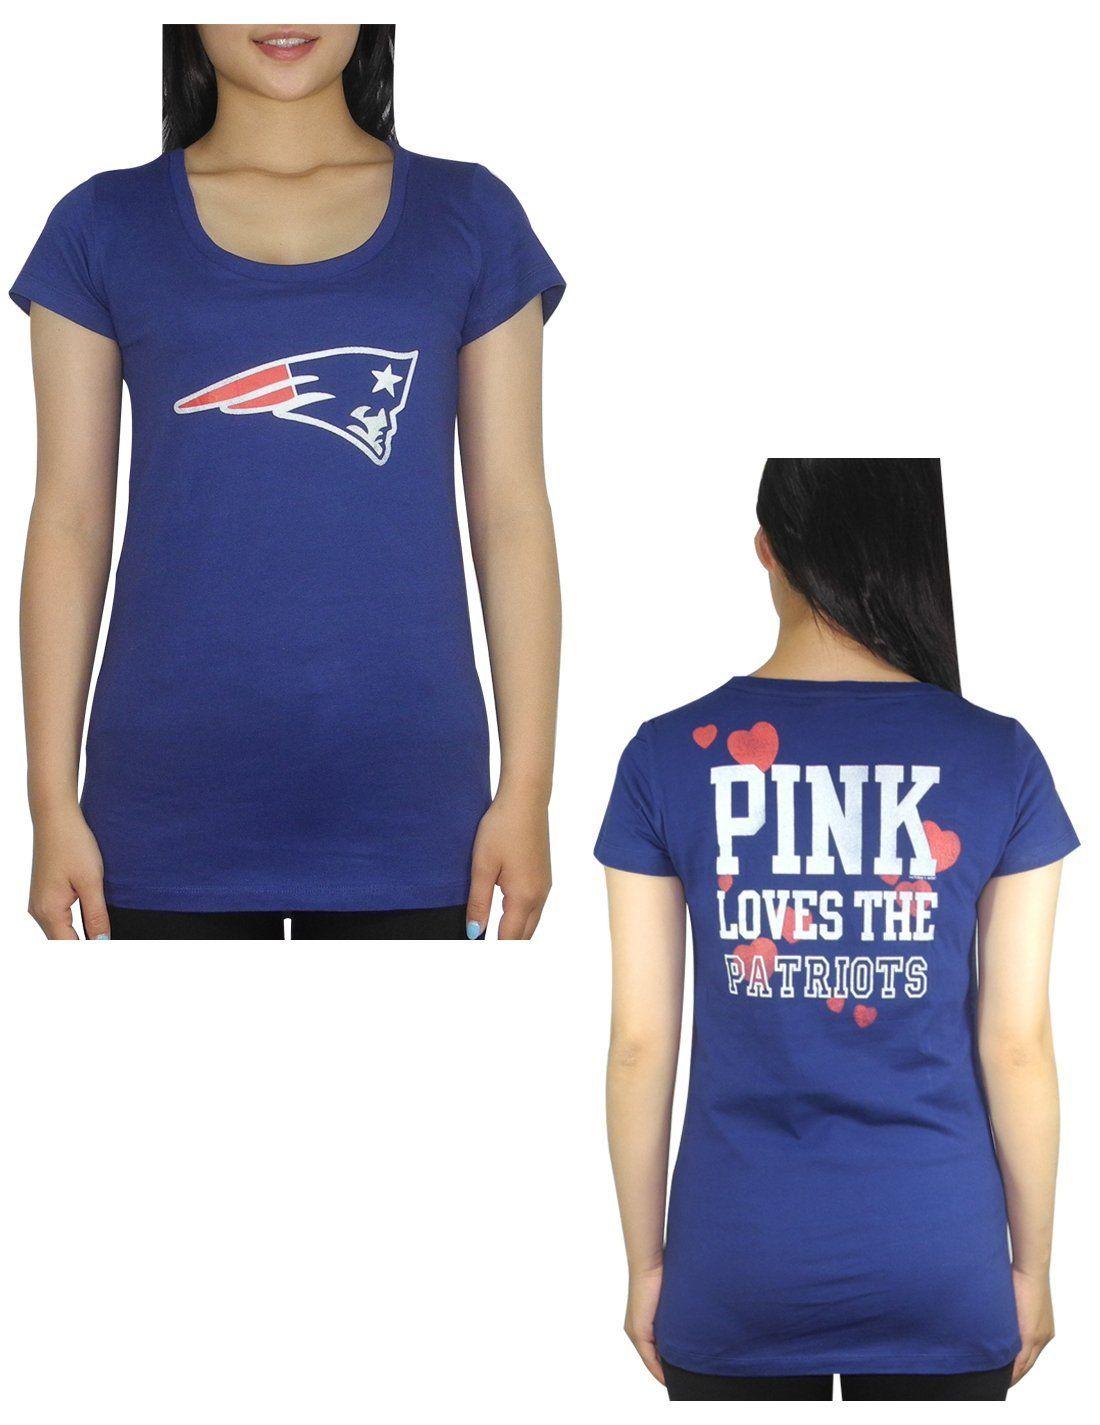 sale retailer e13d5 4b6e6 Amazon.com: Pink Victoria's Secret Womens NE Patriots T ...